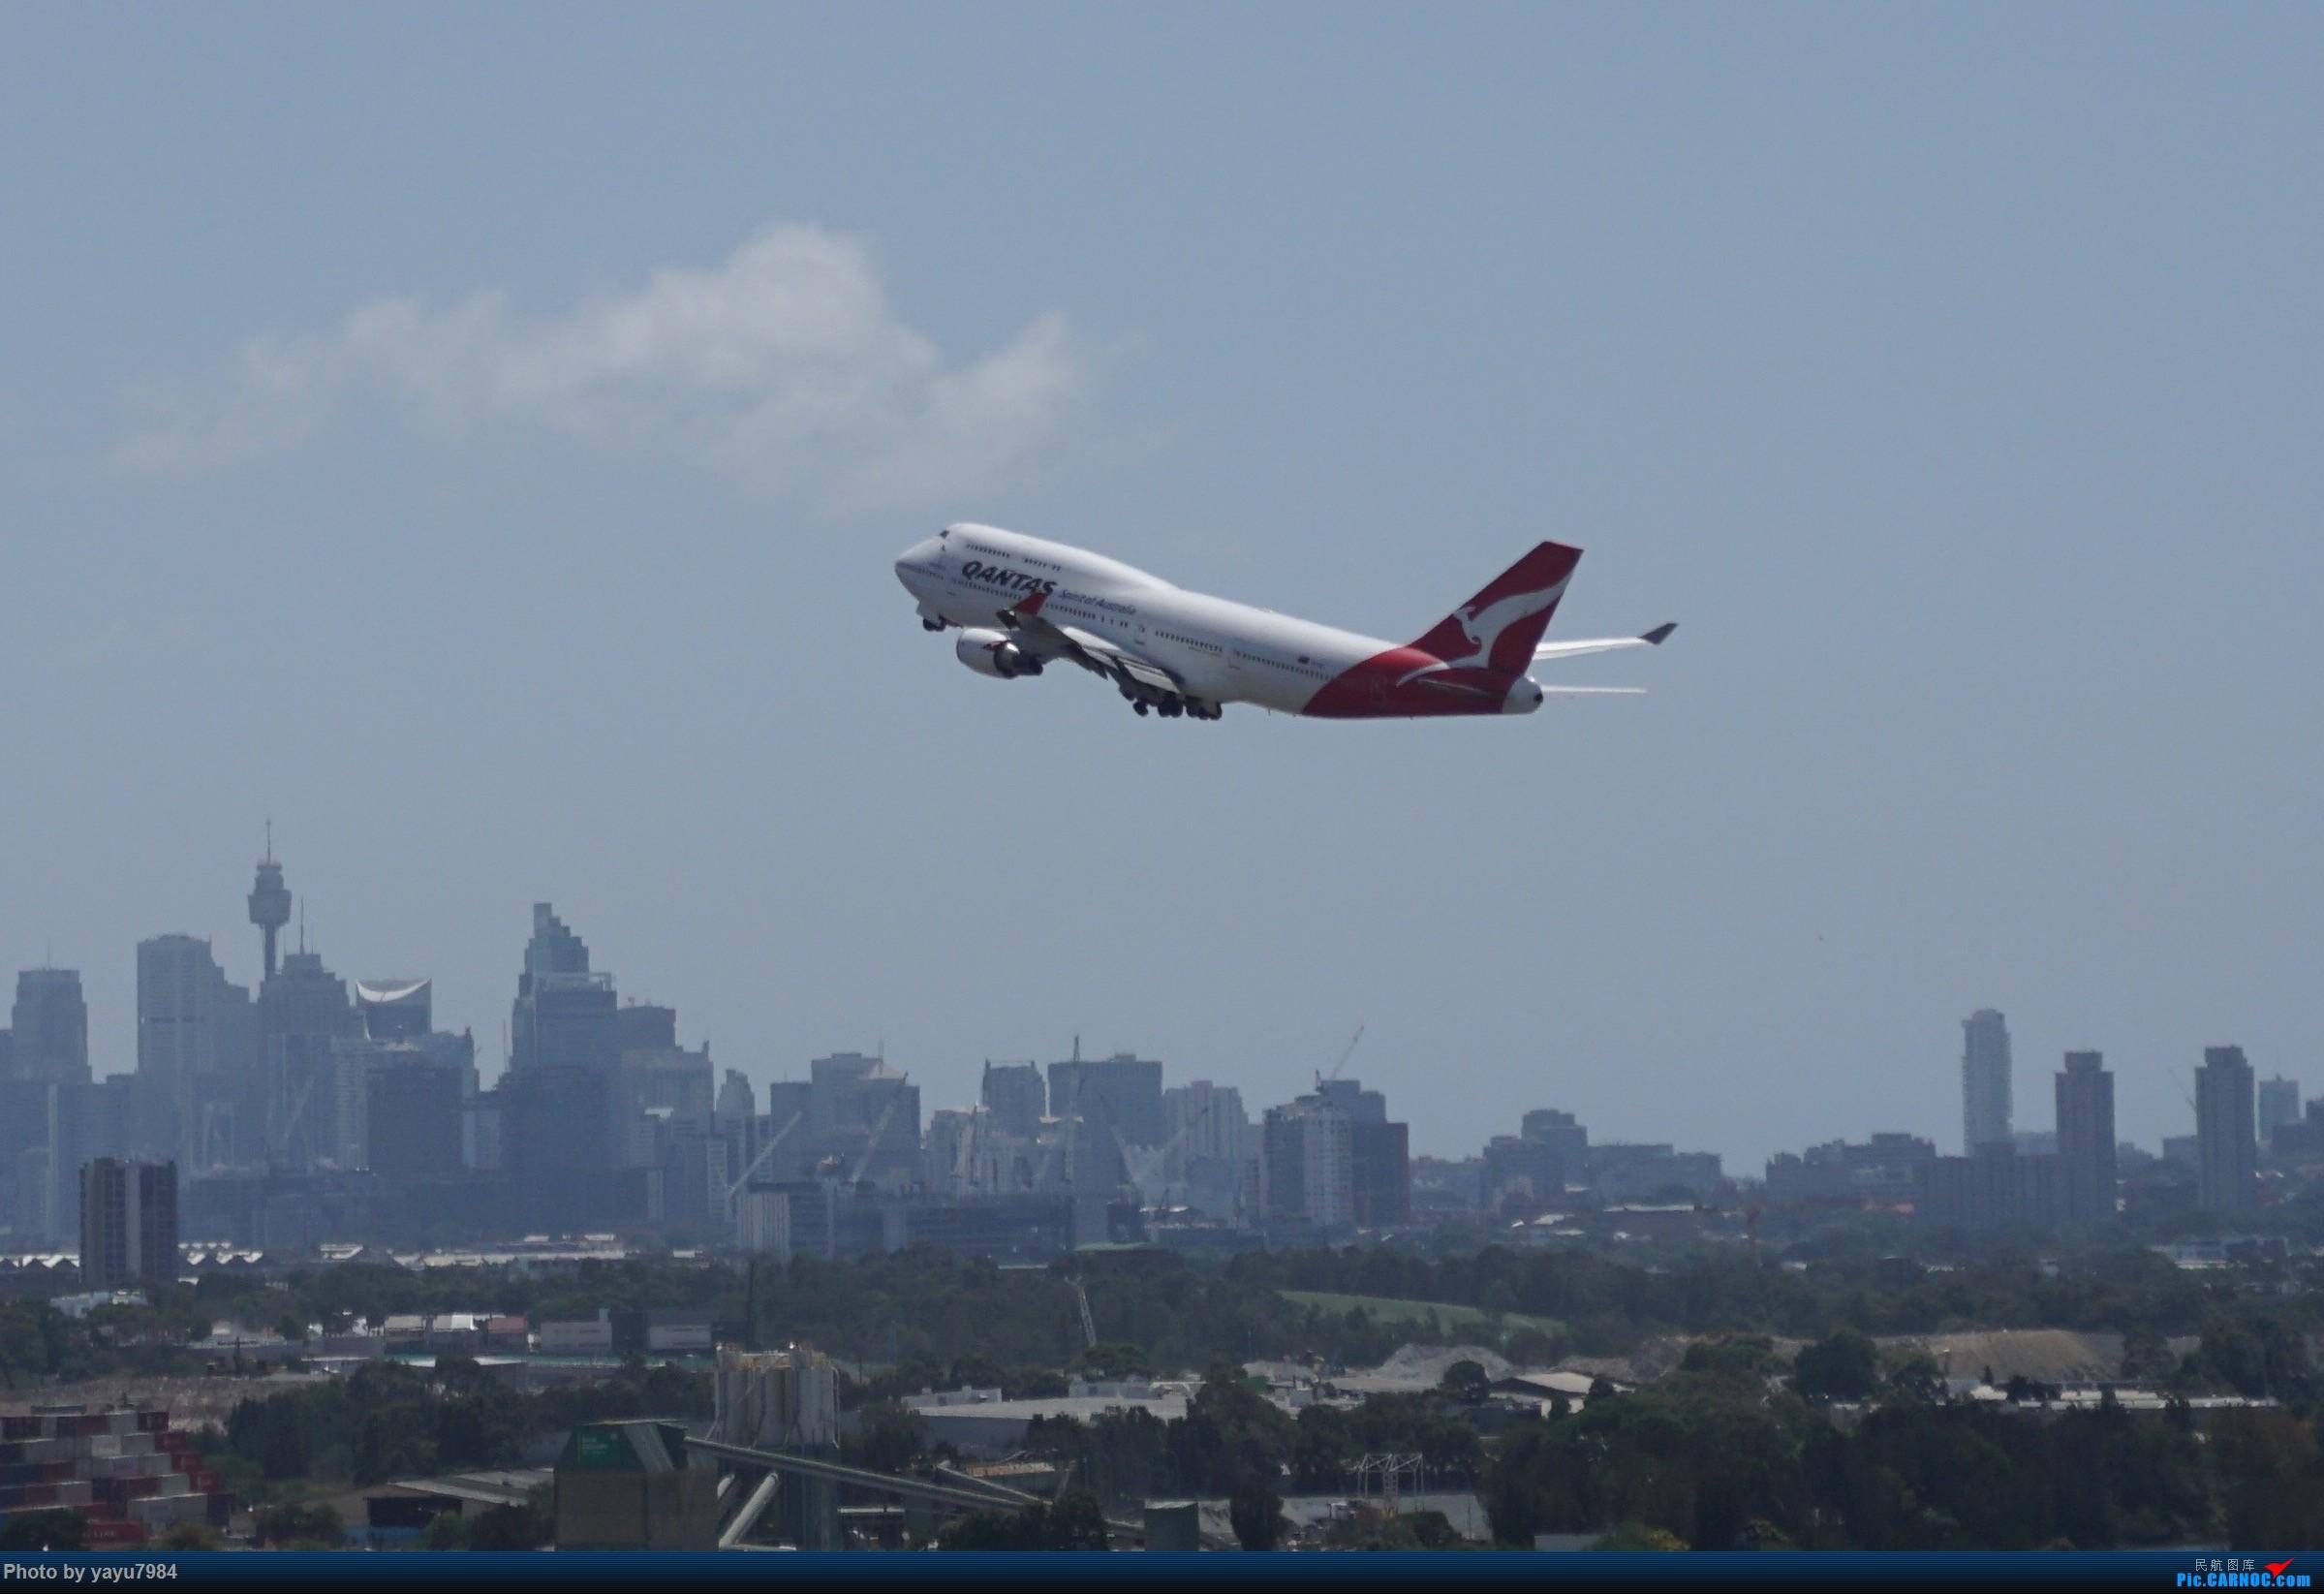 Re:[原创][SYD] 停车楼顶看宽体 BOEING 747-400ER VH-OEJ 澳大利亚悉尼金斯福德·史密斯机场